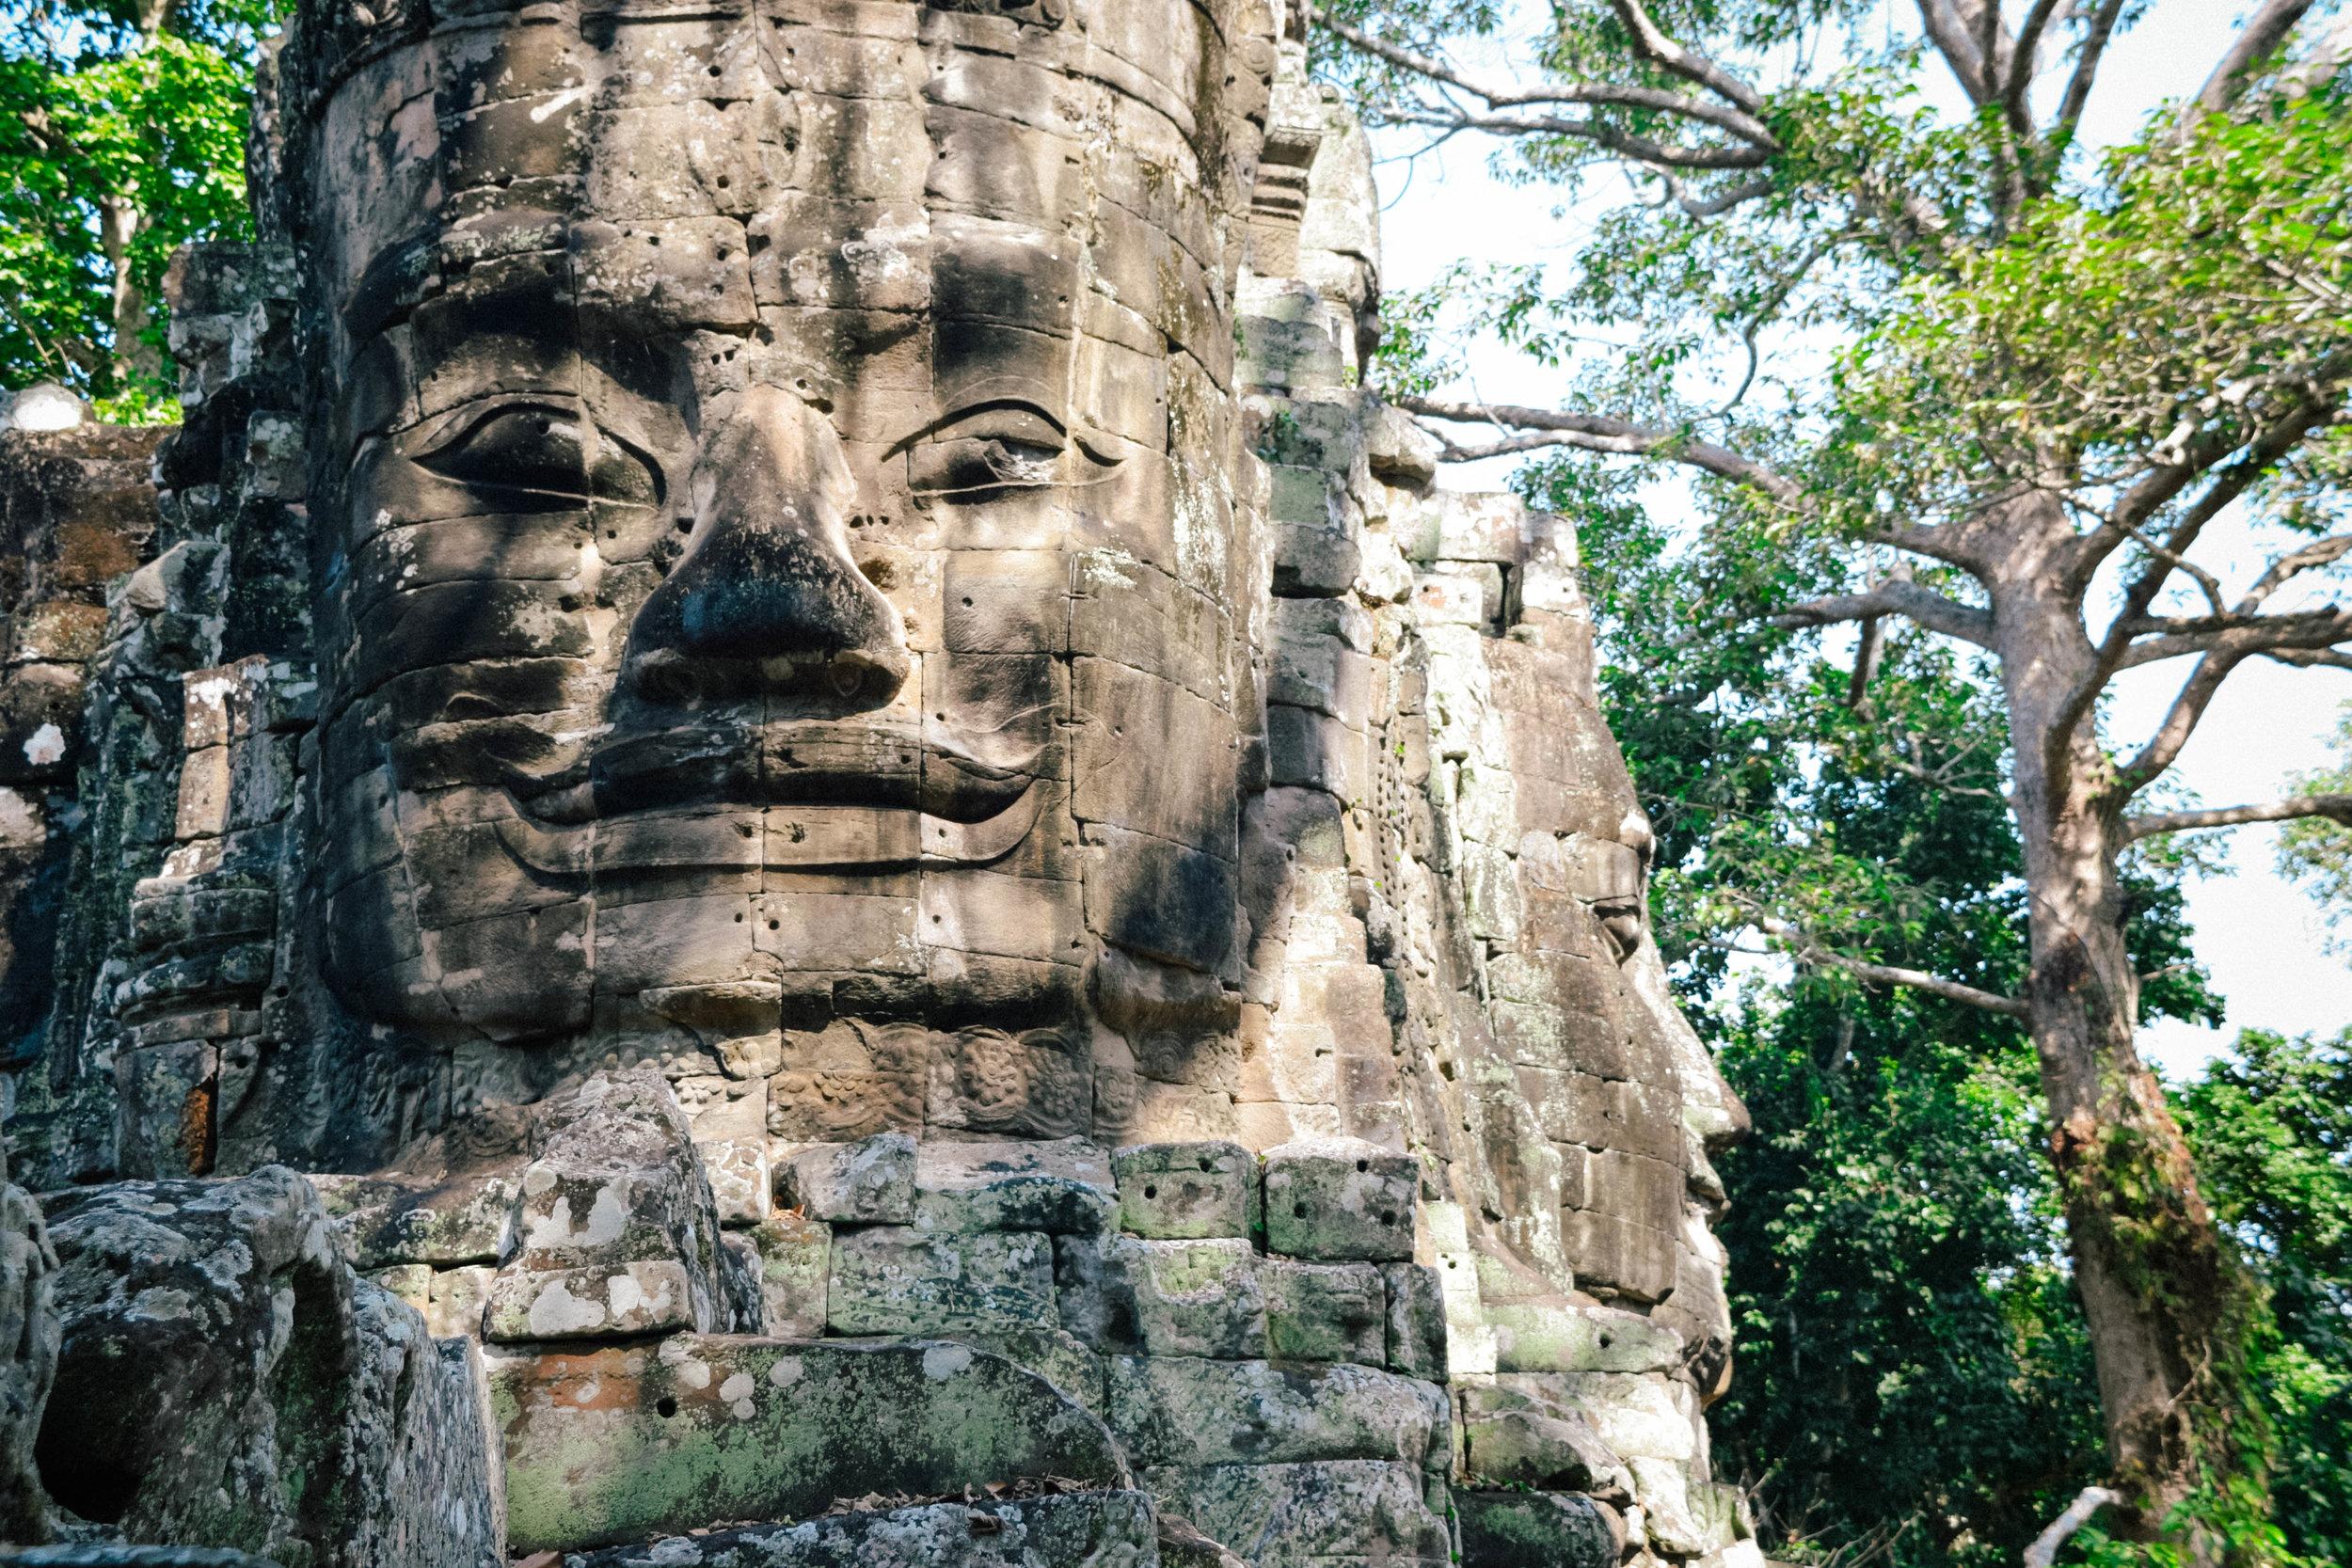 Angkor Wat east gate face